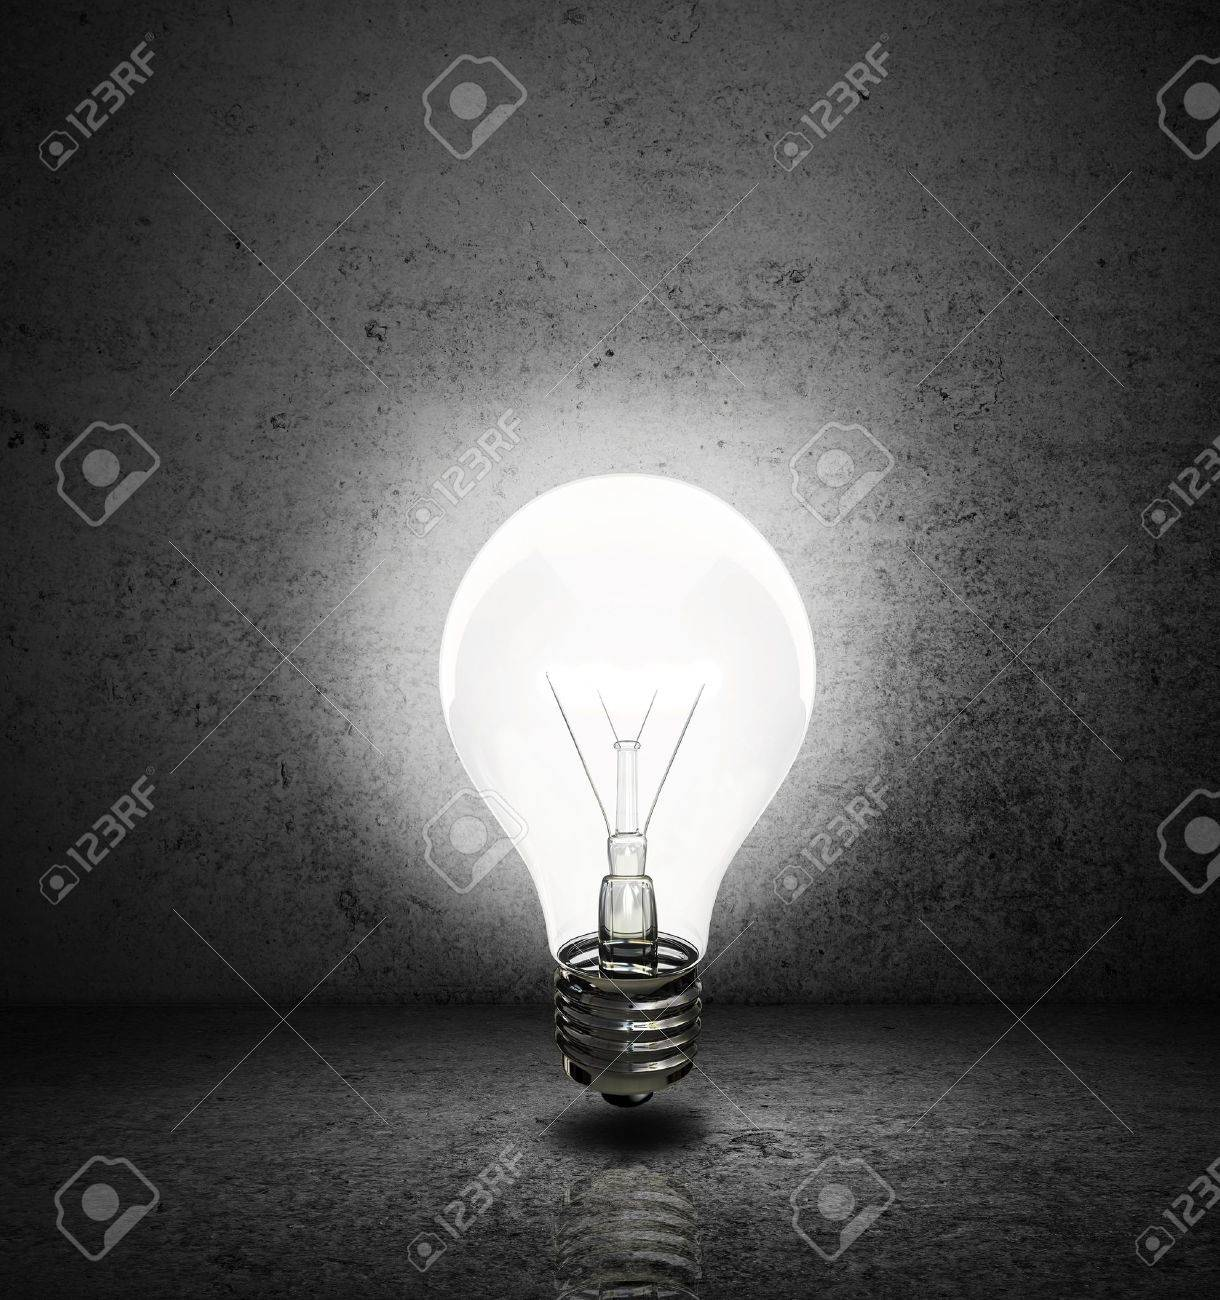 Dark room with light bulb - Stock Photo High Resolution Lightbulb With Dark Room